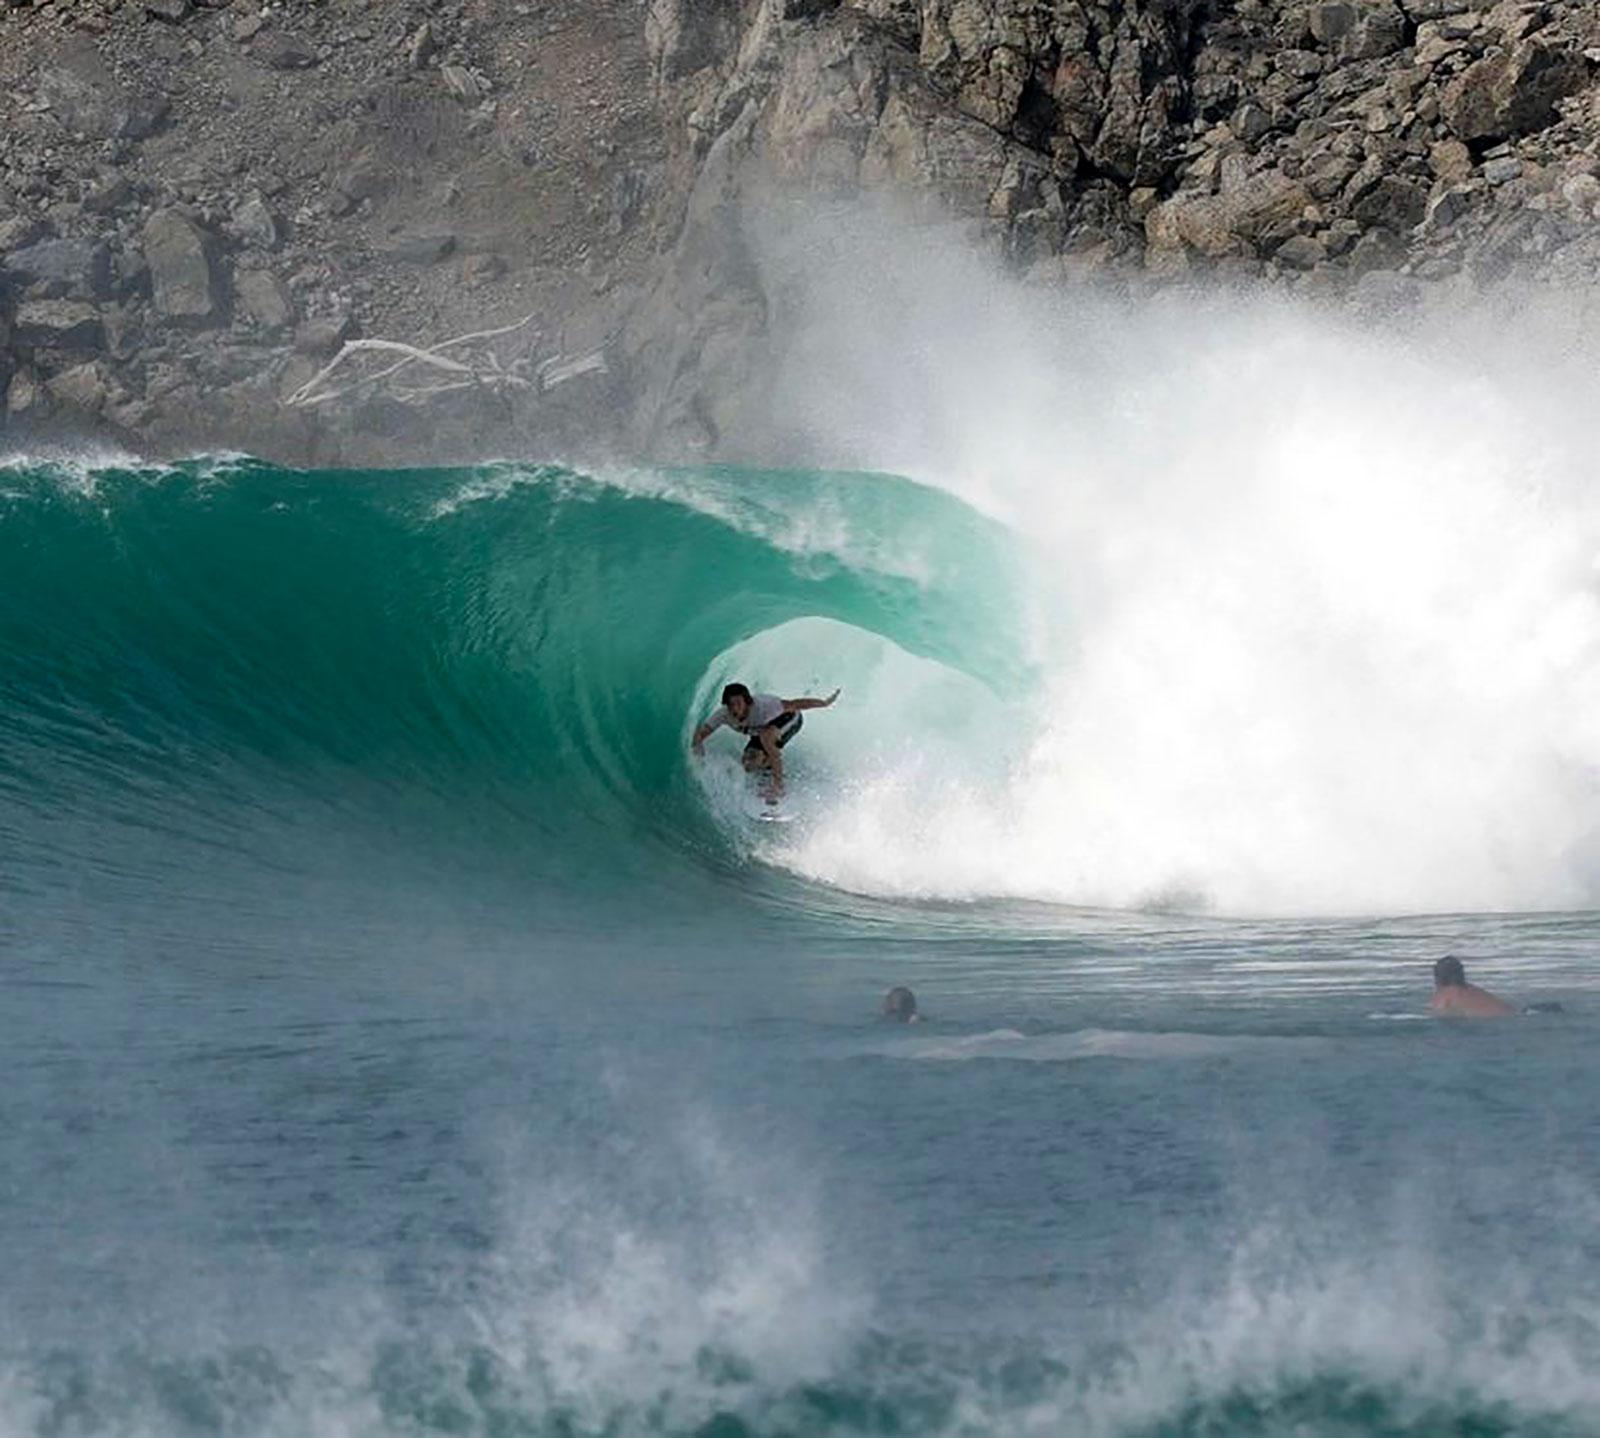 Shane Borland scoring Escondida in Salina Cruz, Oaxaca, Mexico at Las Palmeras Surf Resort